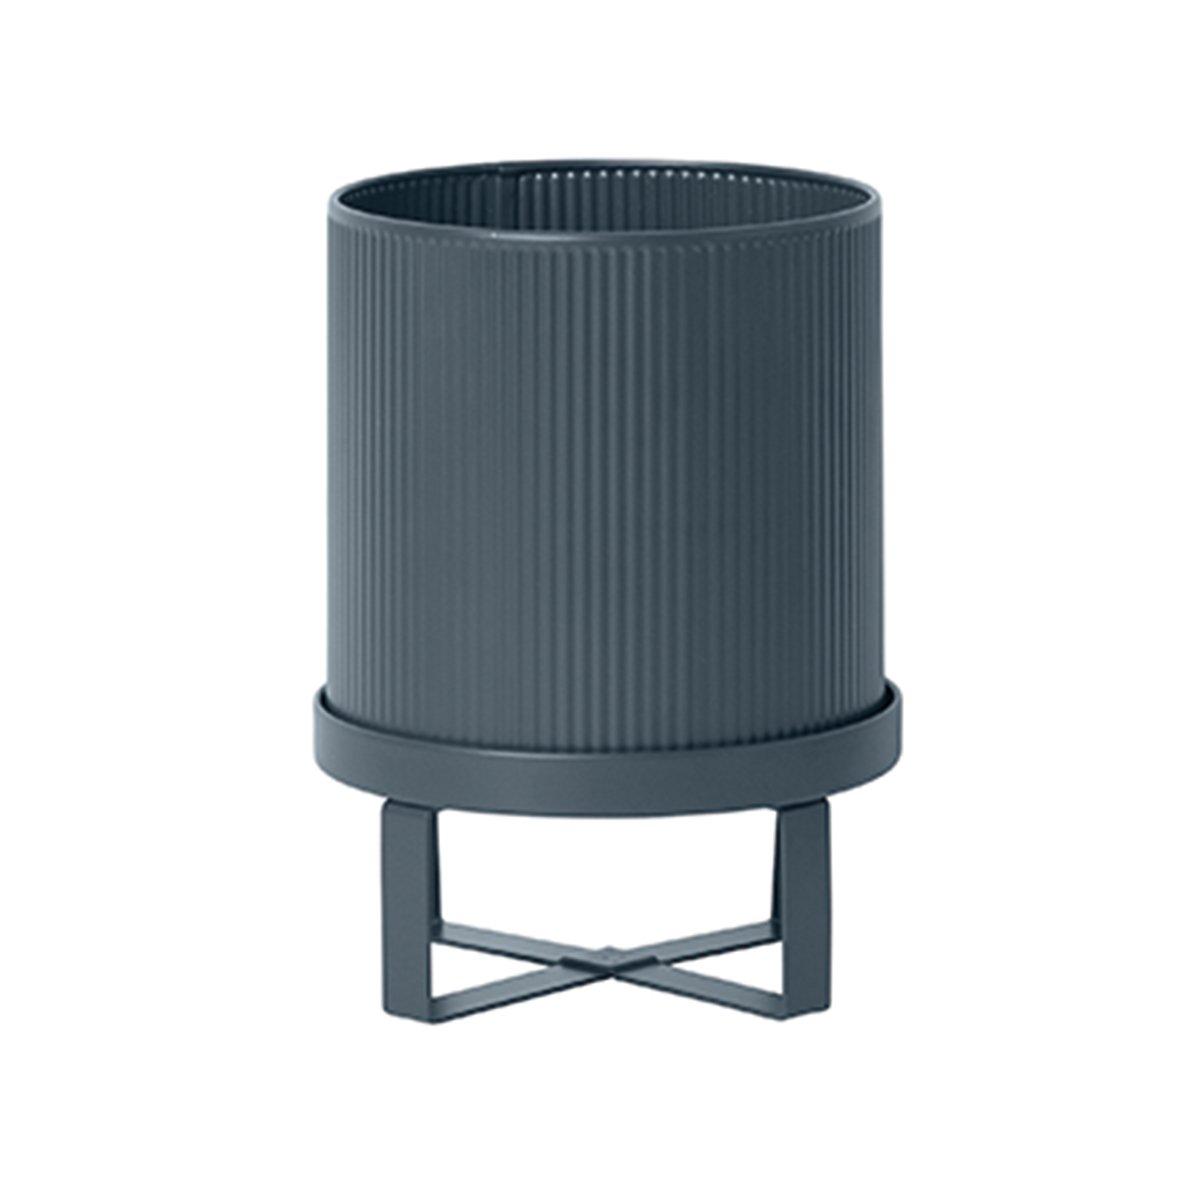 Ferm Living Bau Pot - Small/Donkerblauw